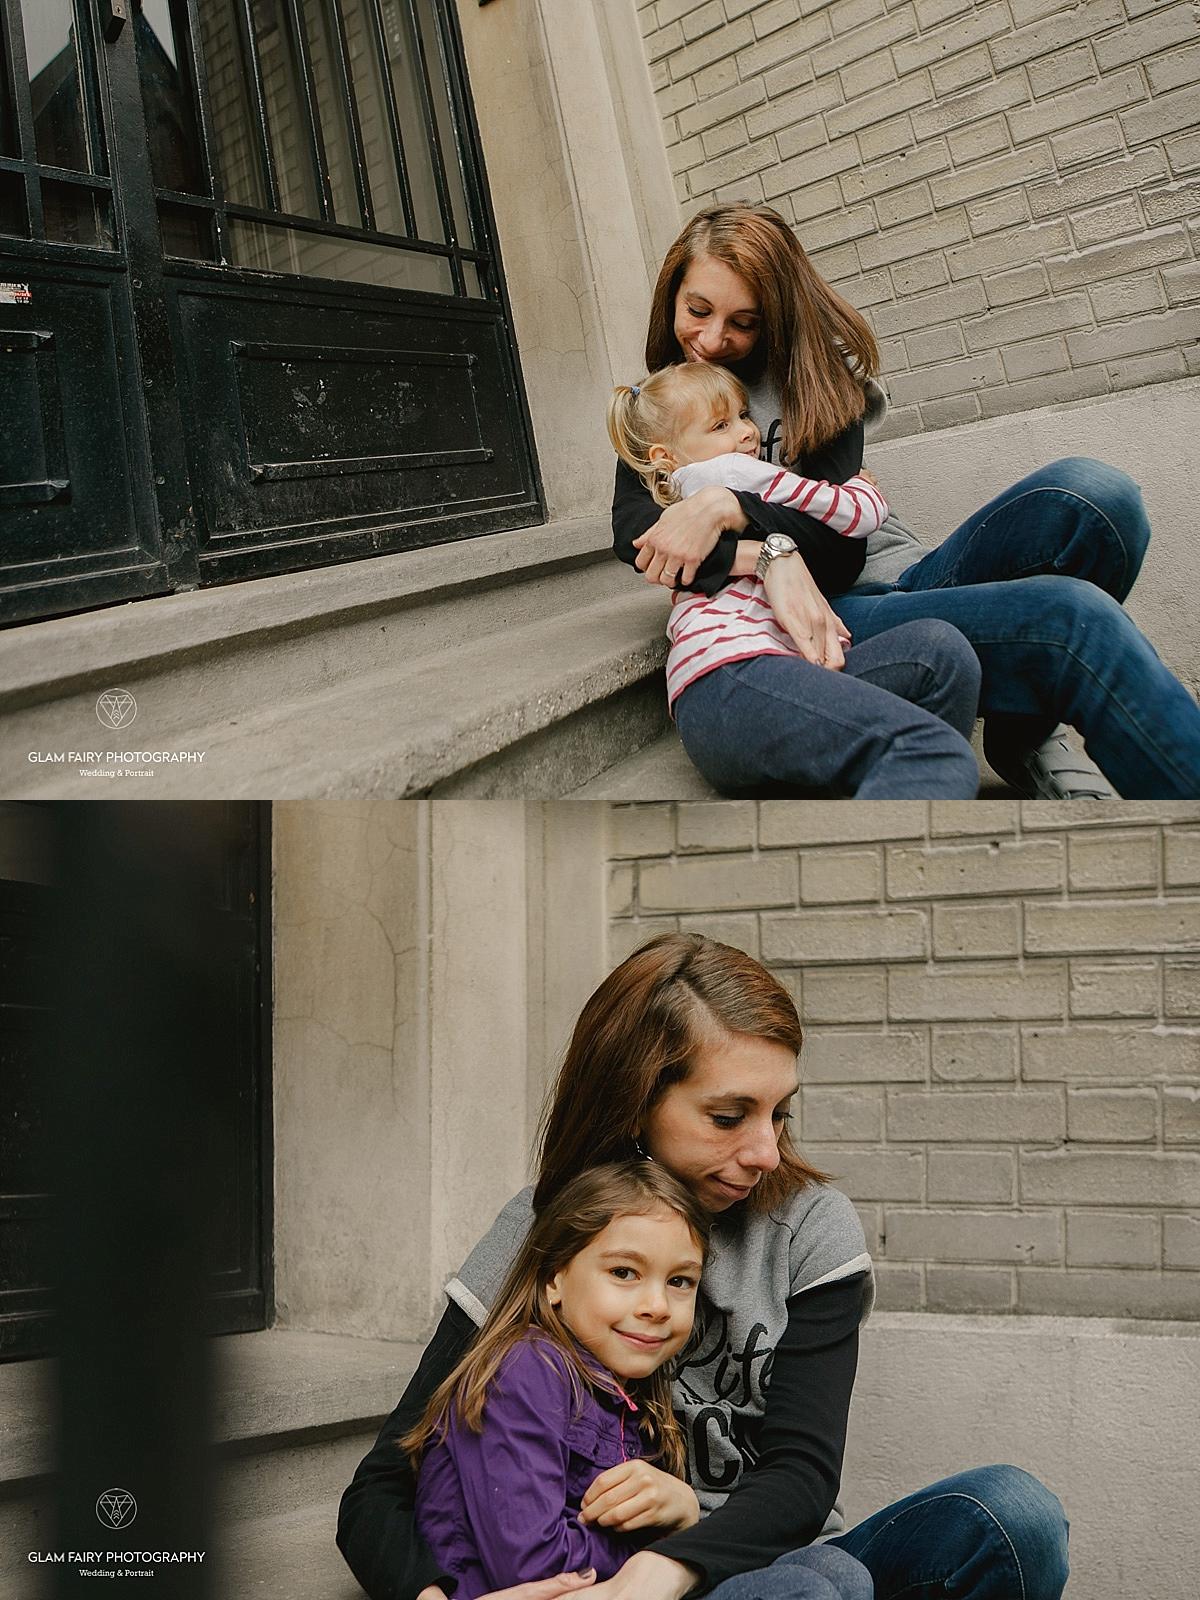 GlamFairyPhotography-séance-photo-famille-montmartre-virgnie_0007